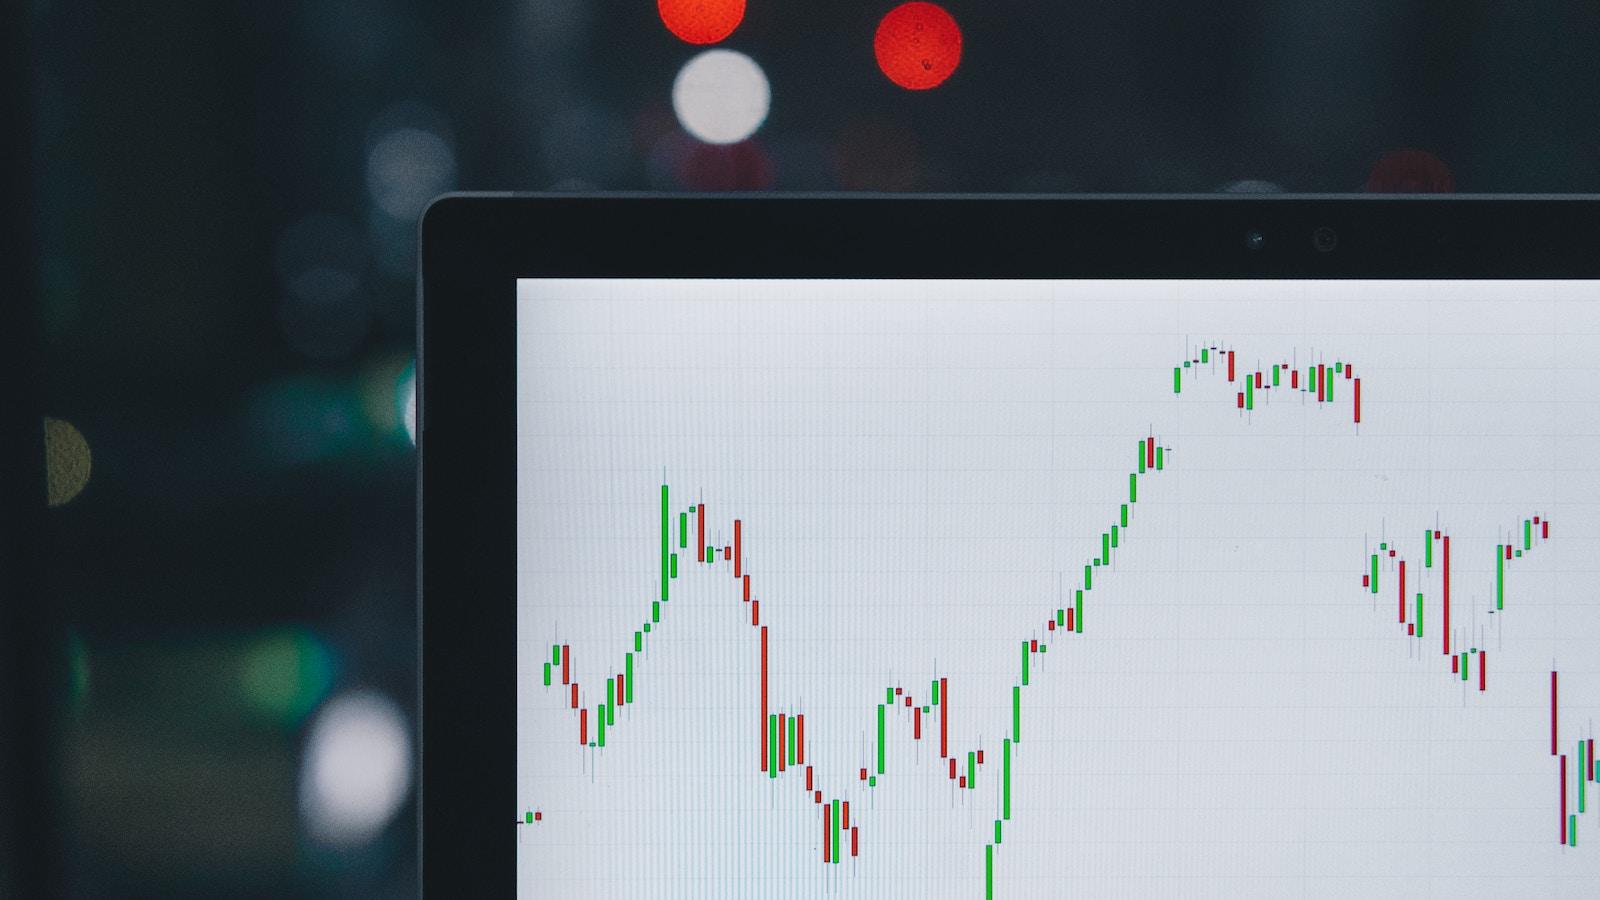 Binance offers 125X margin borrowing for high-risk traders